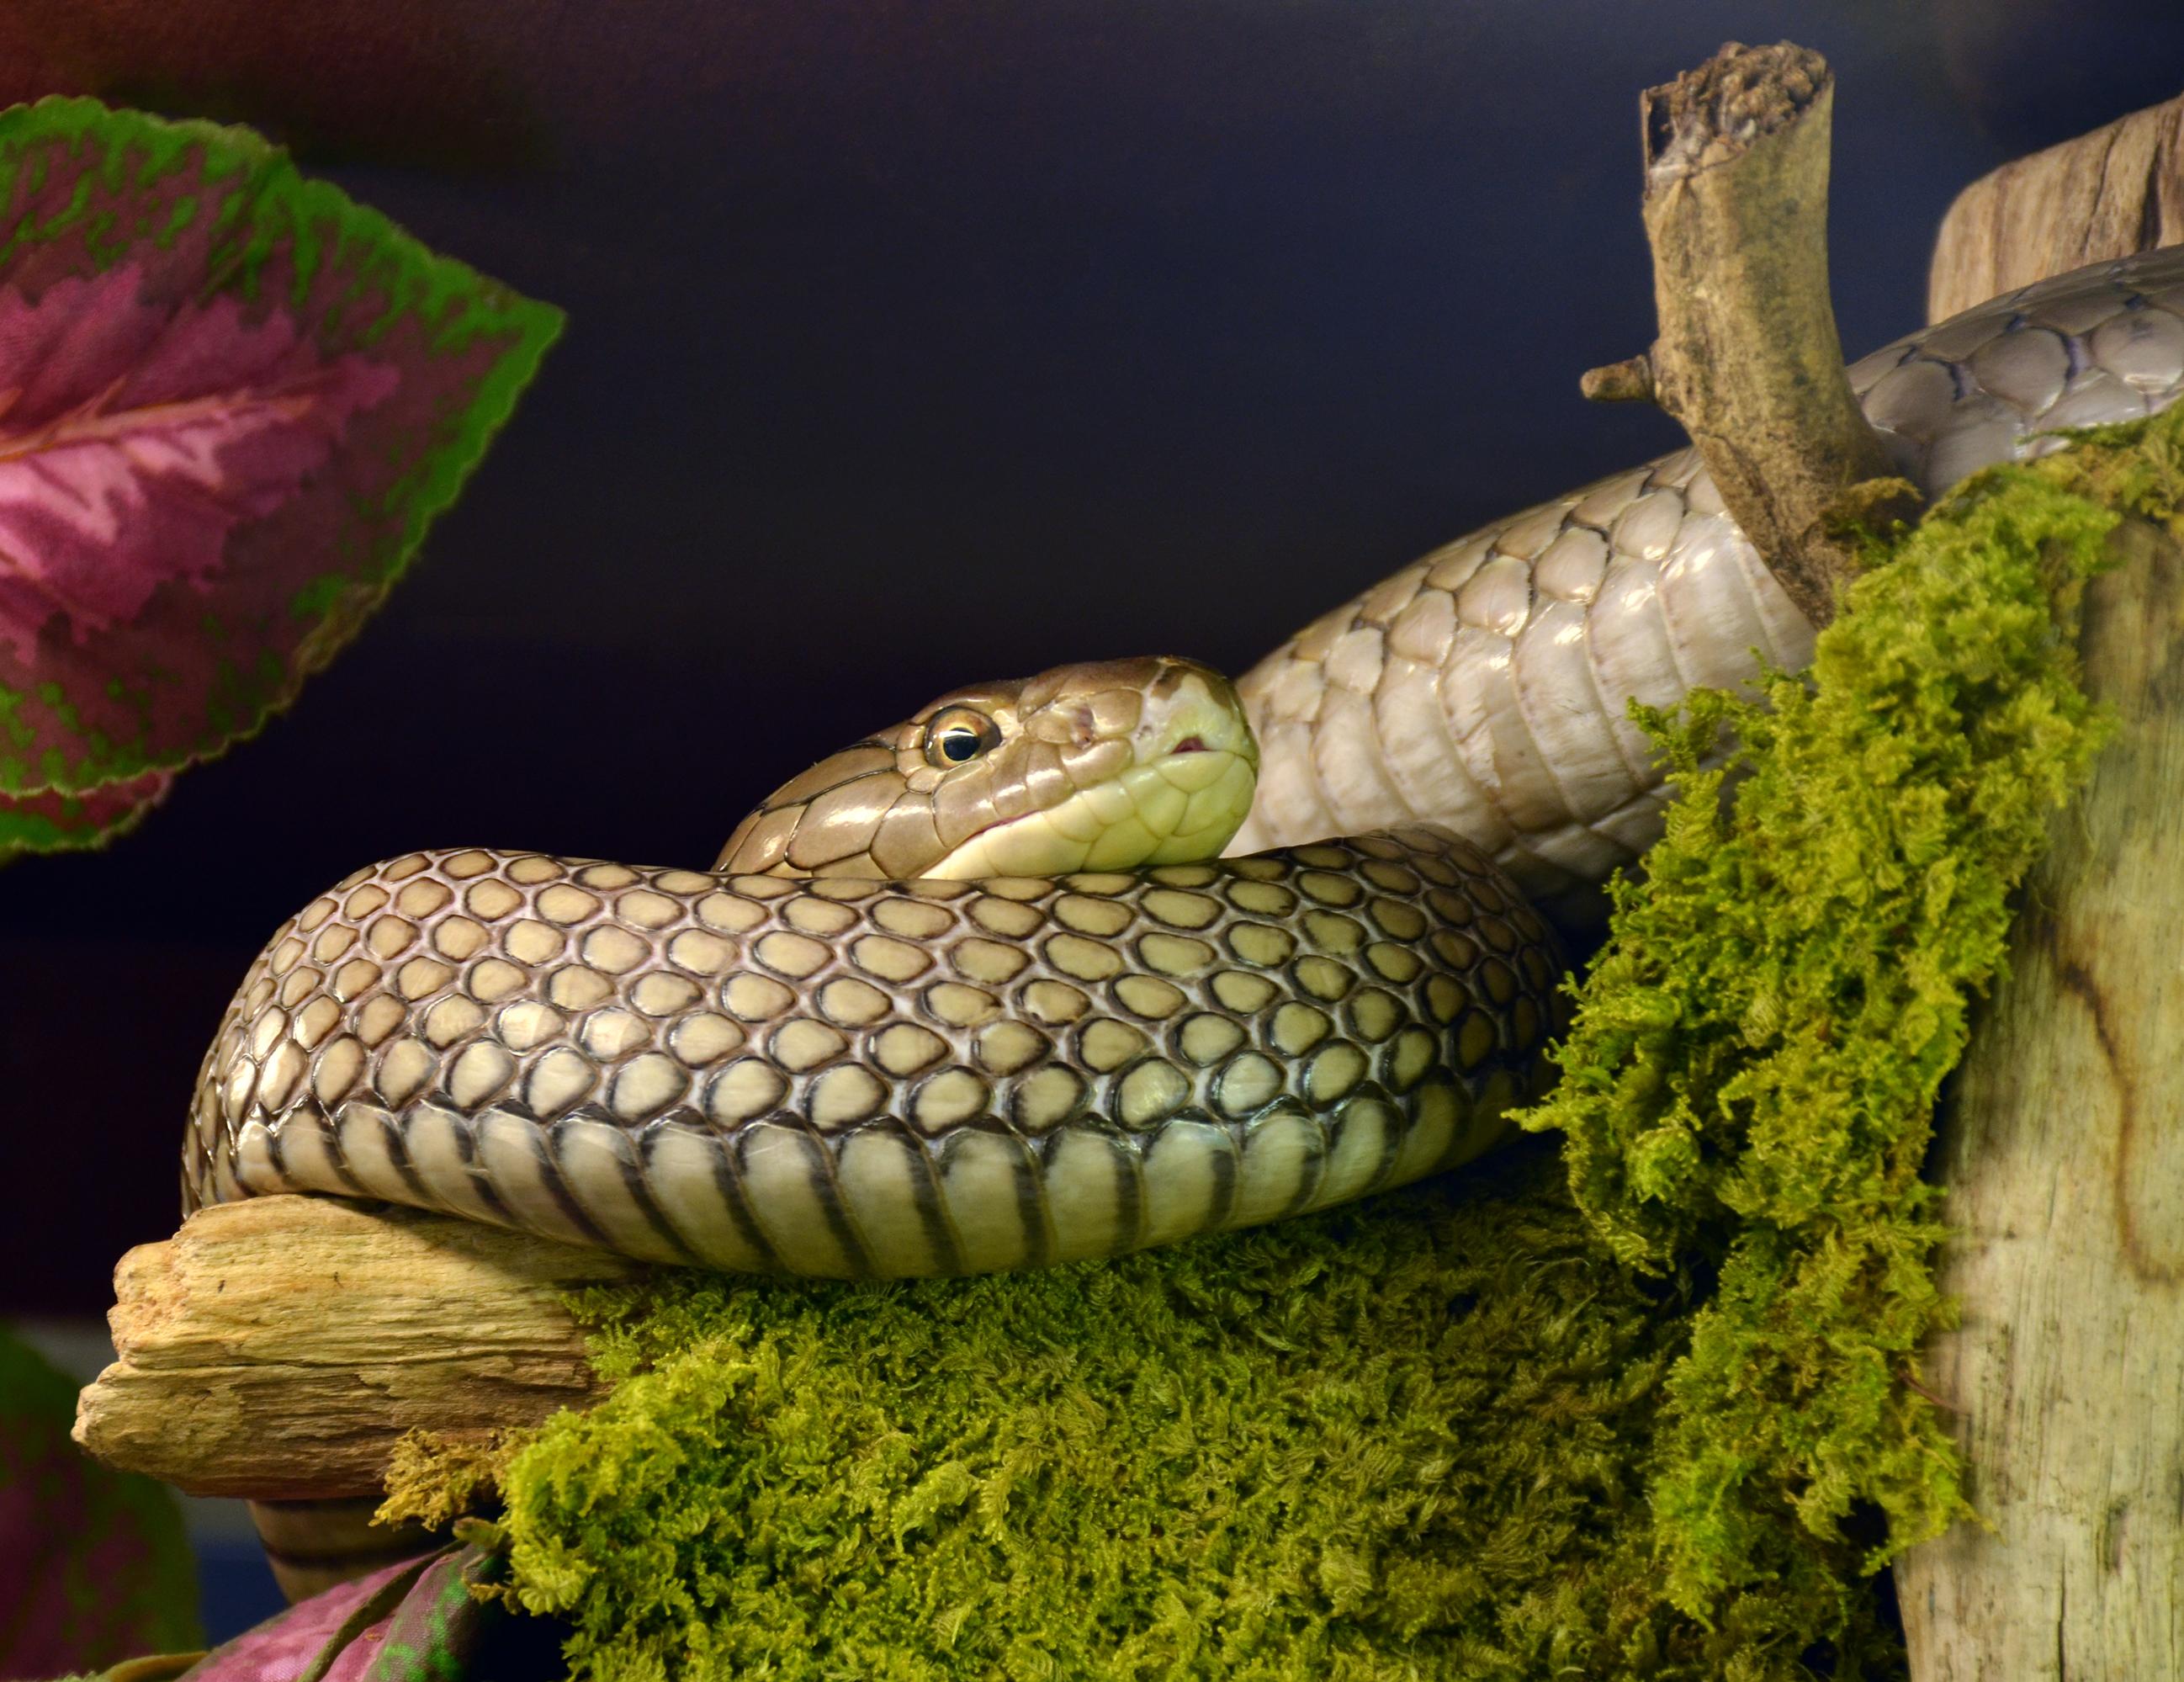 File:Ophiophagus hannah Genève 24102014 1.jpg - Wikimedia